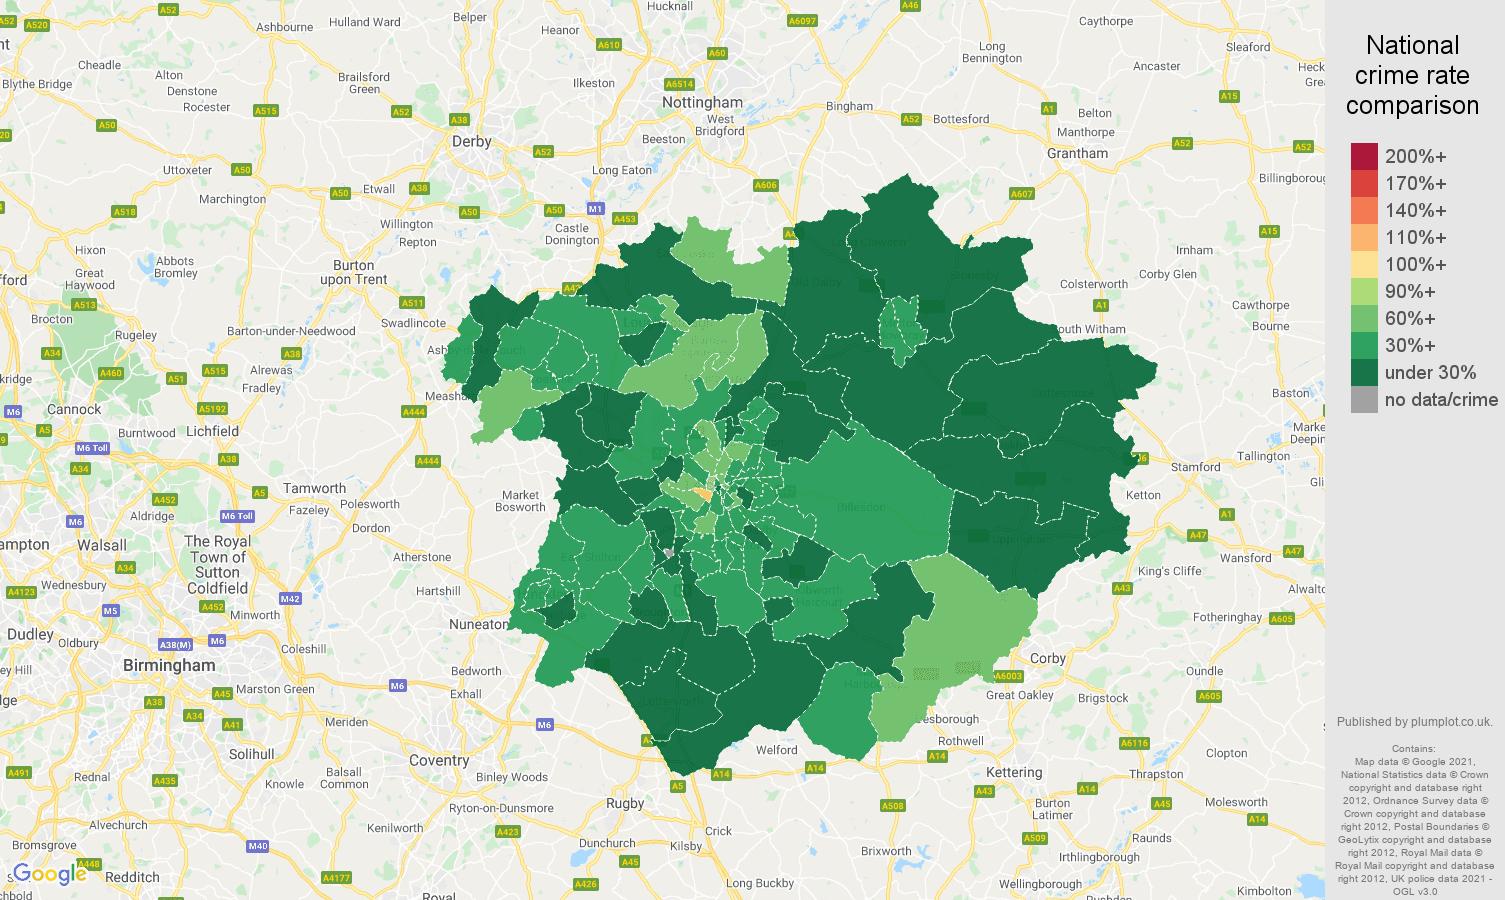 Leicester antisocial behaviour crime rate comparison map